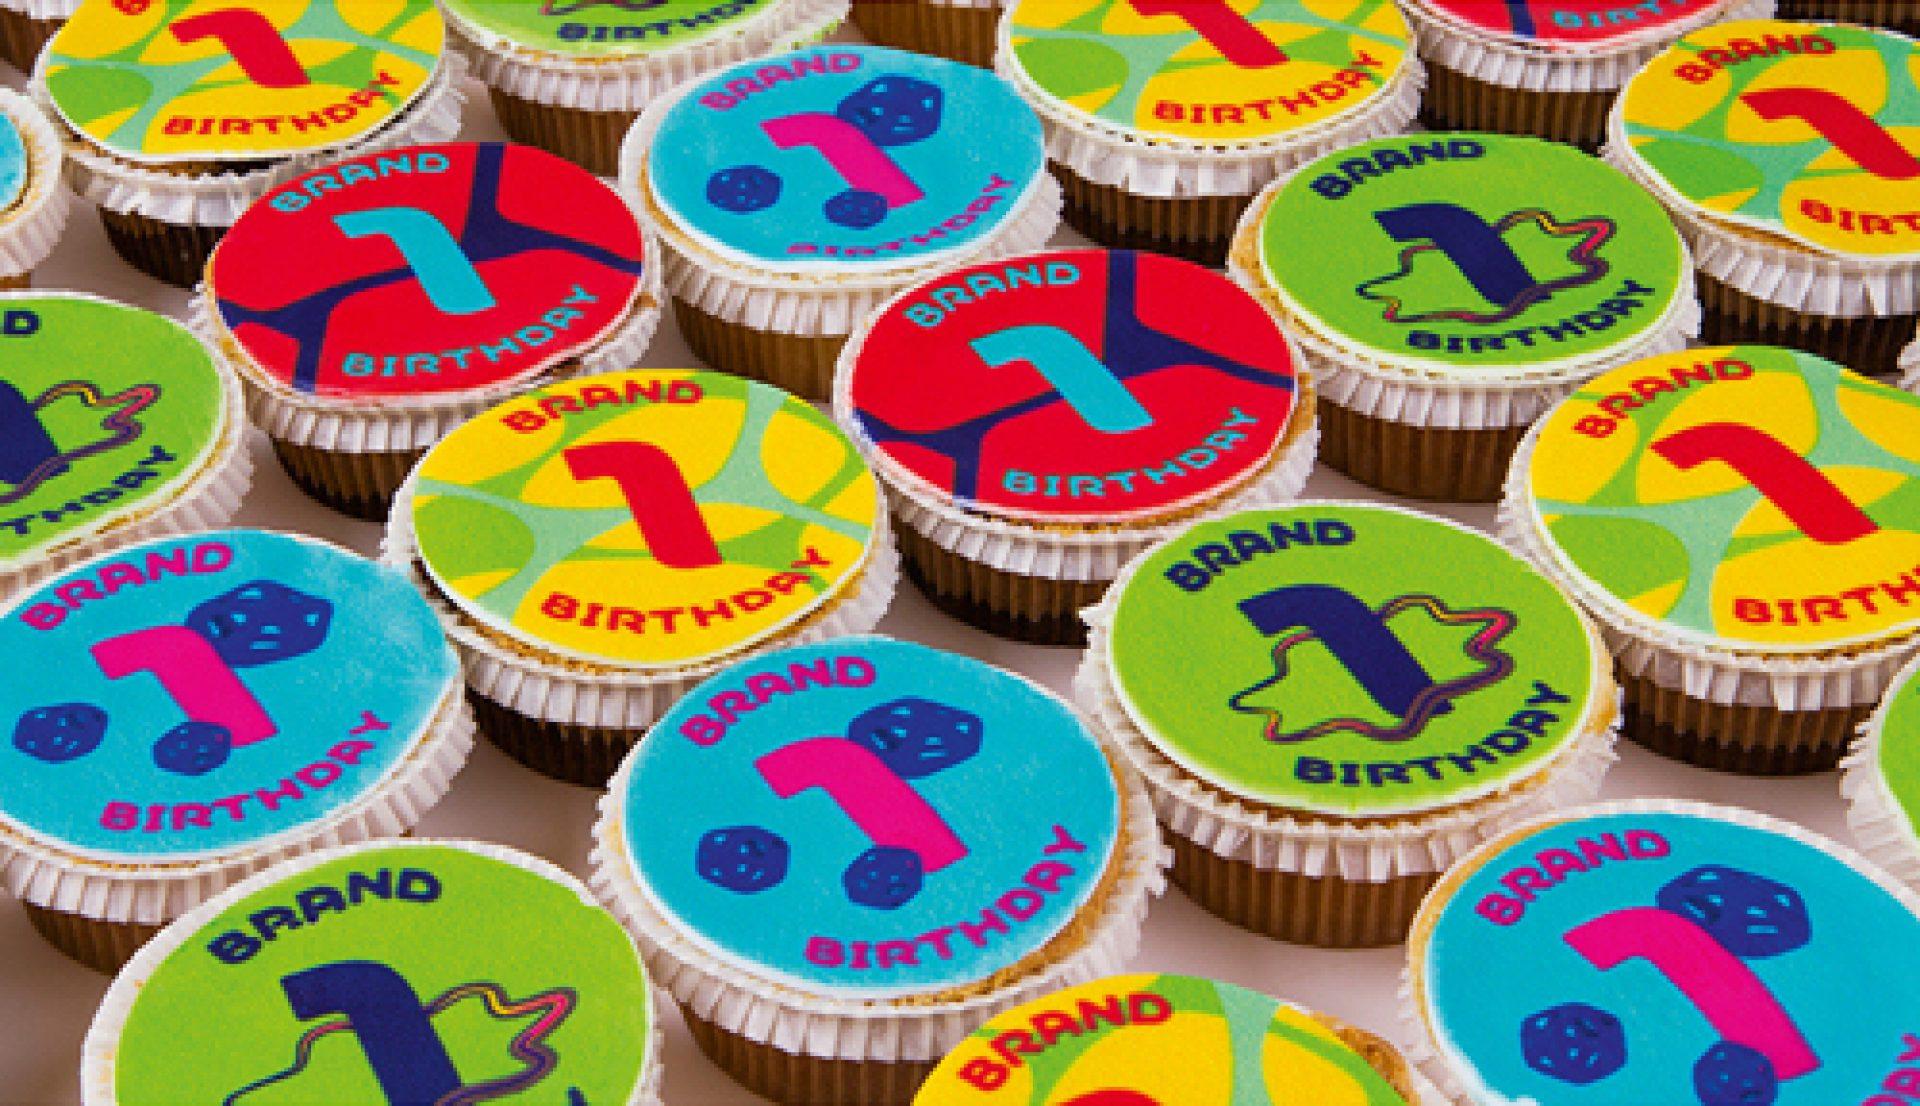 Merck: 50,000 brand ambassadors in three steps